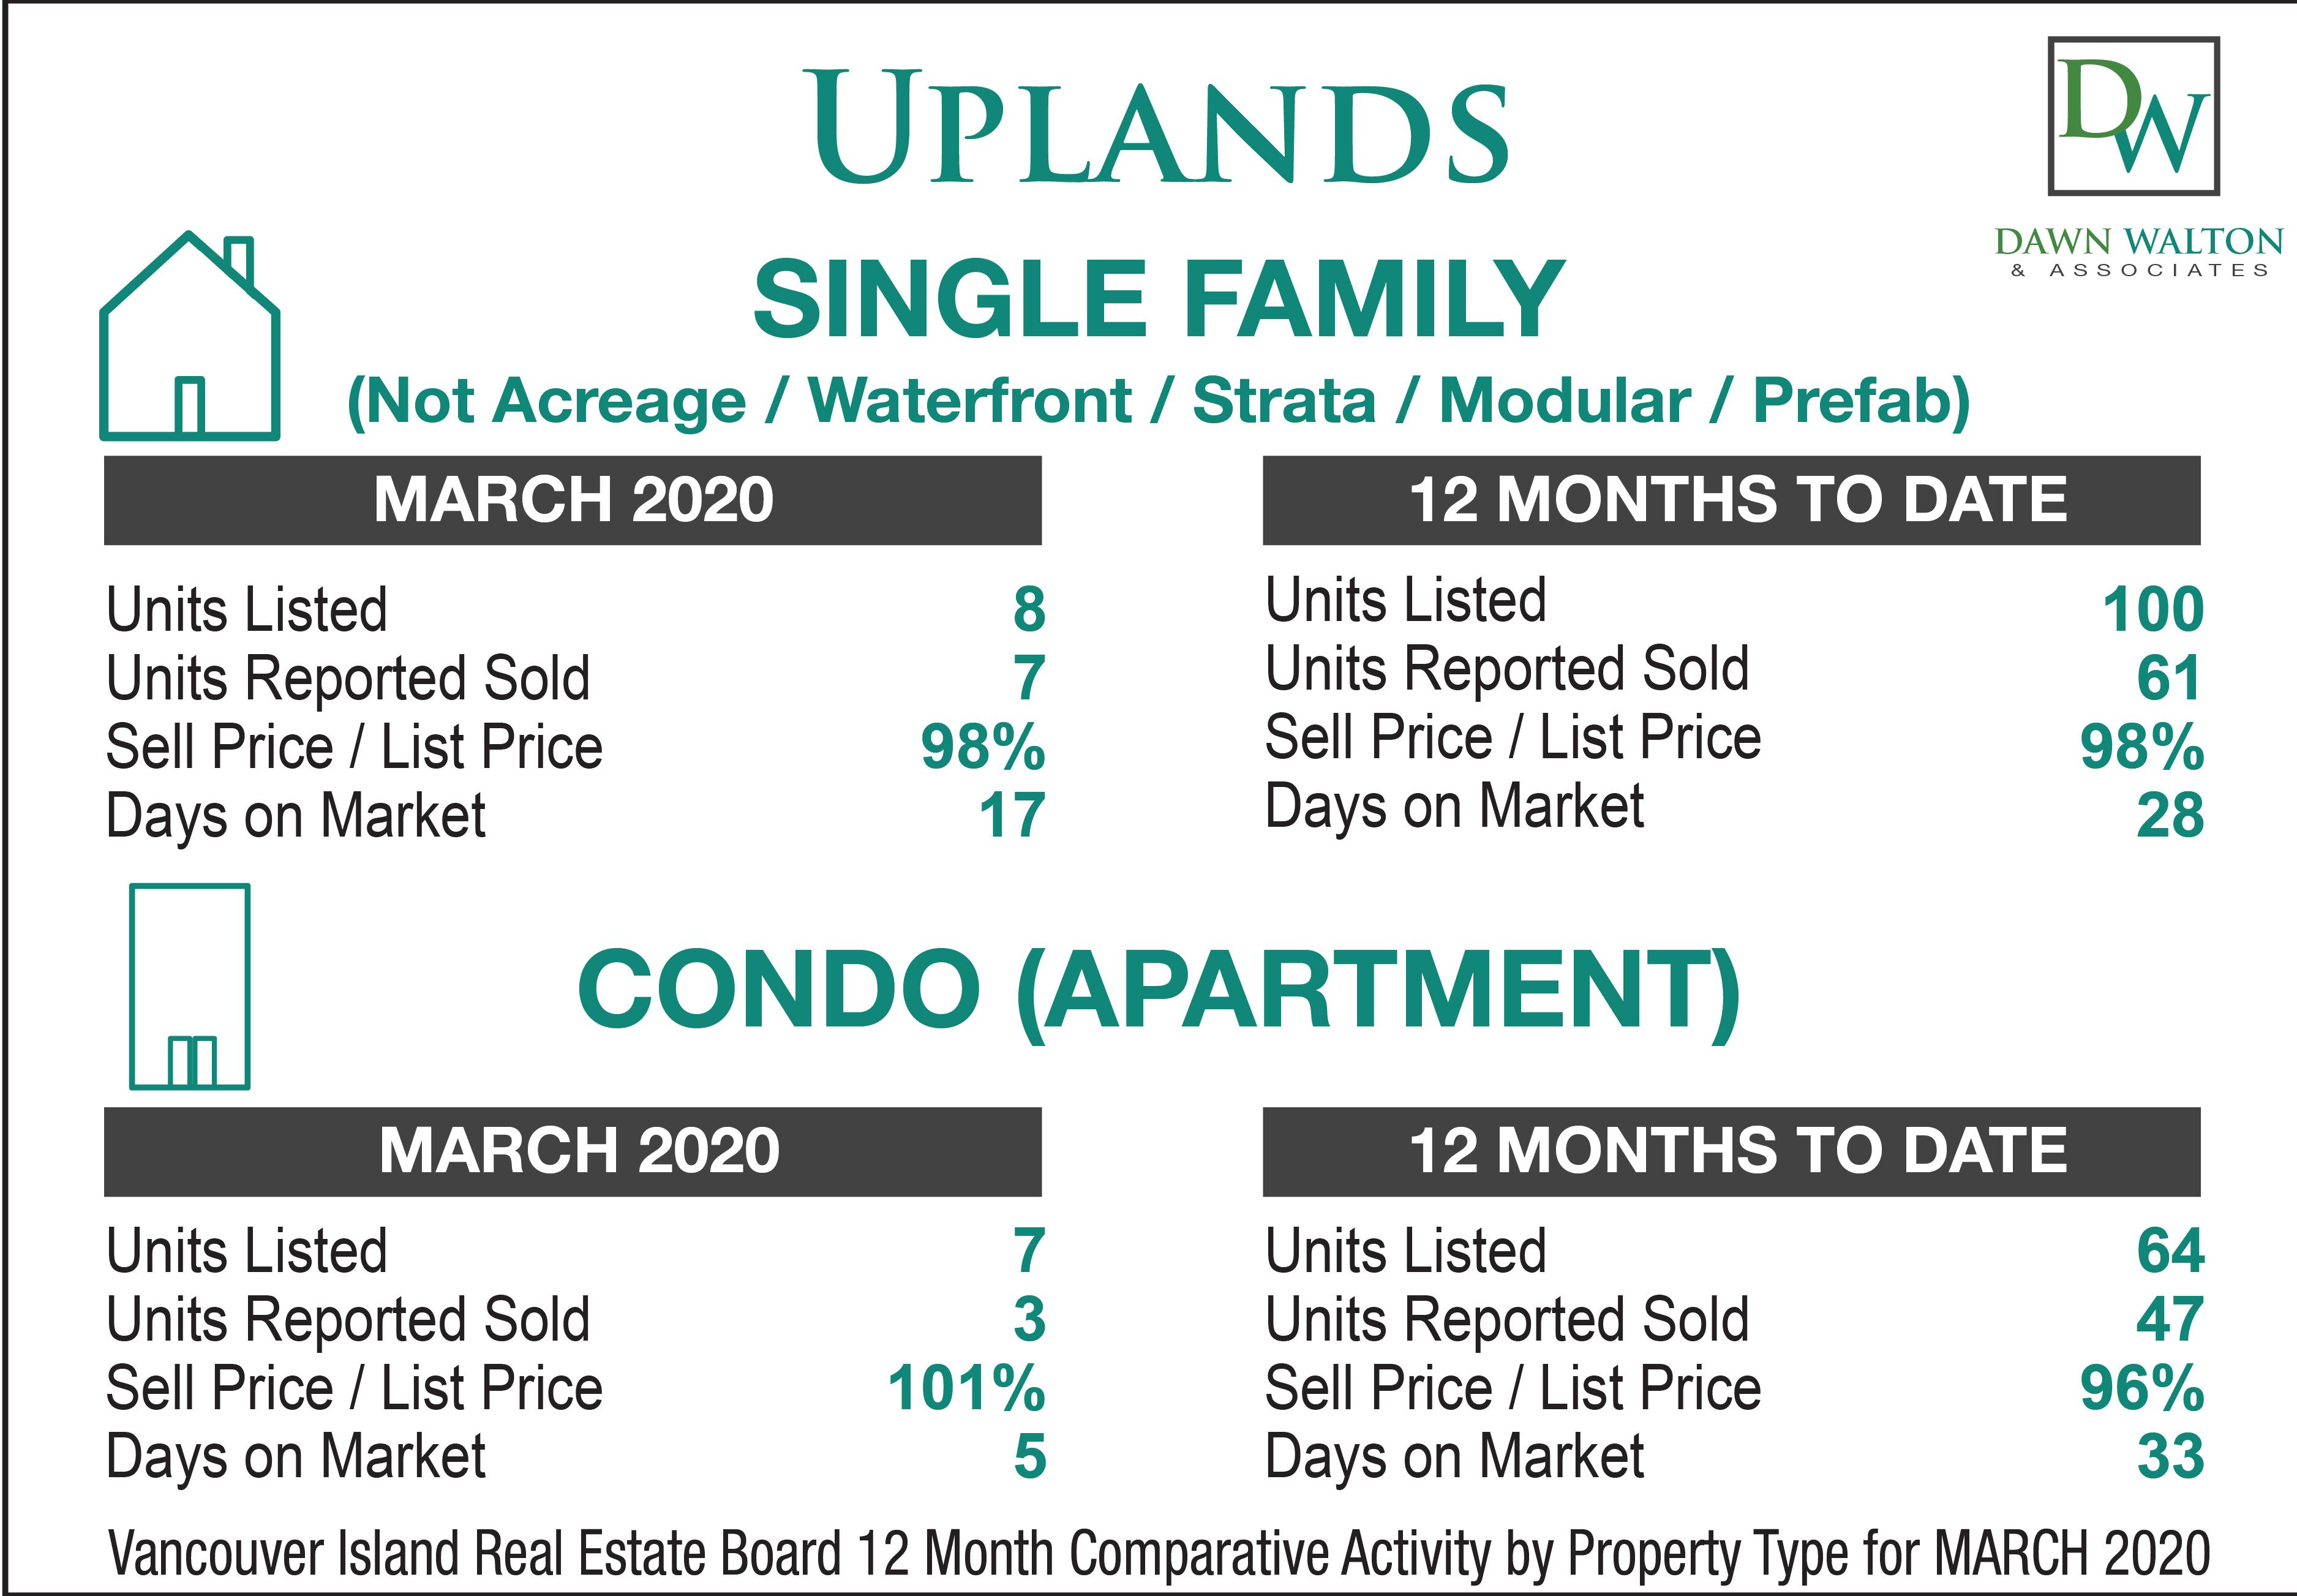 Uplands Real Estate Market Stats March 2020 - Nanaimo Realtor Dawn Walton